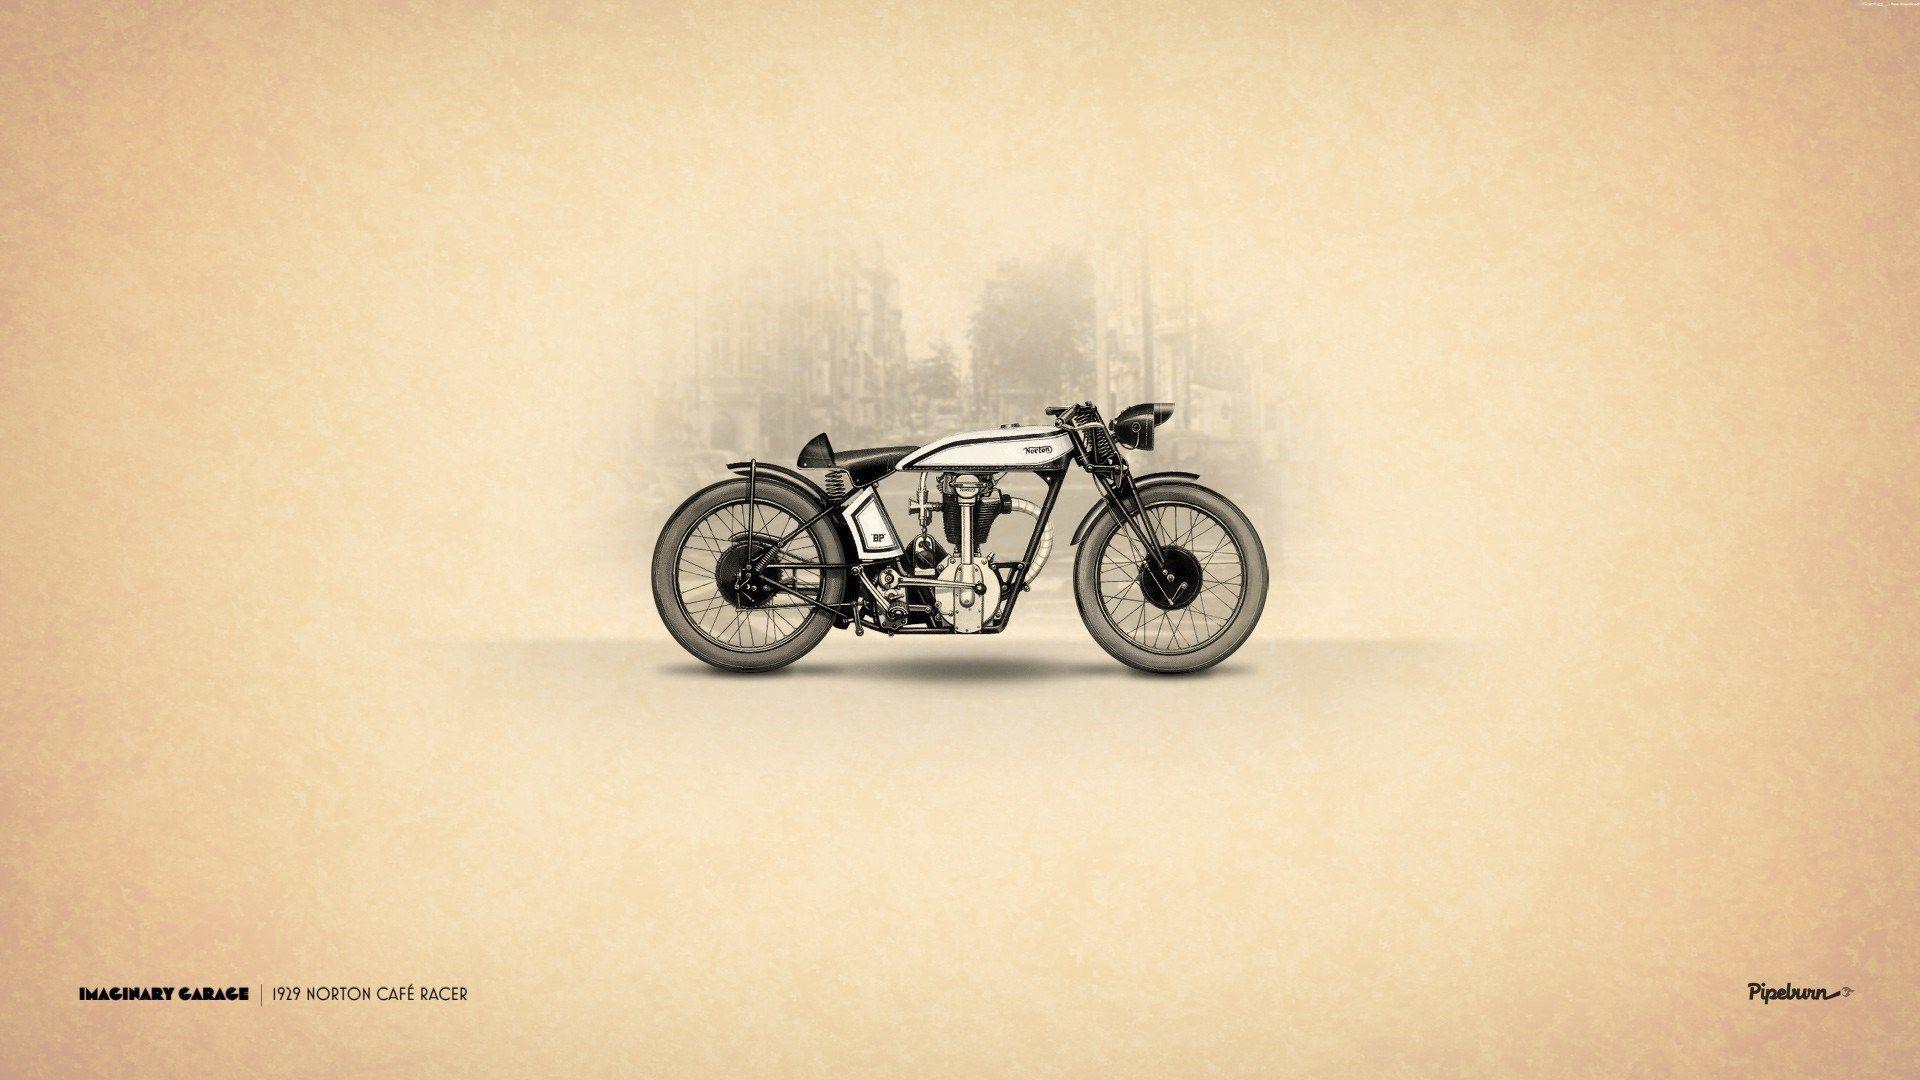 Motorcycle Art Wallpapers   Top Motorcycle Art Backgrounds 1920x1080